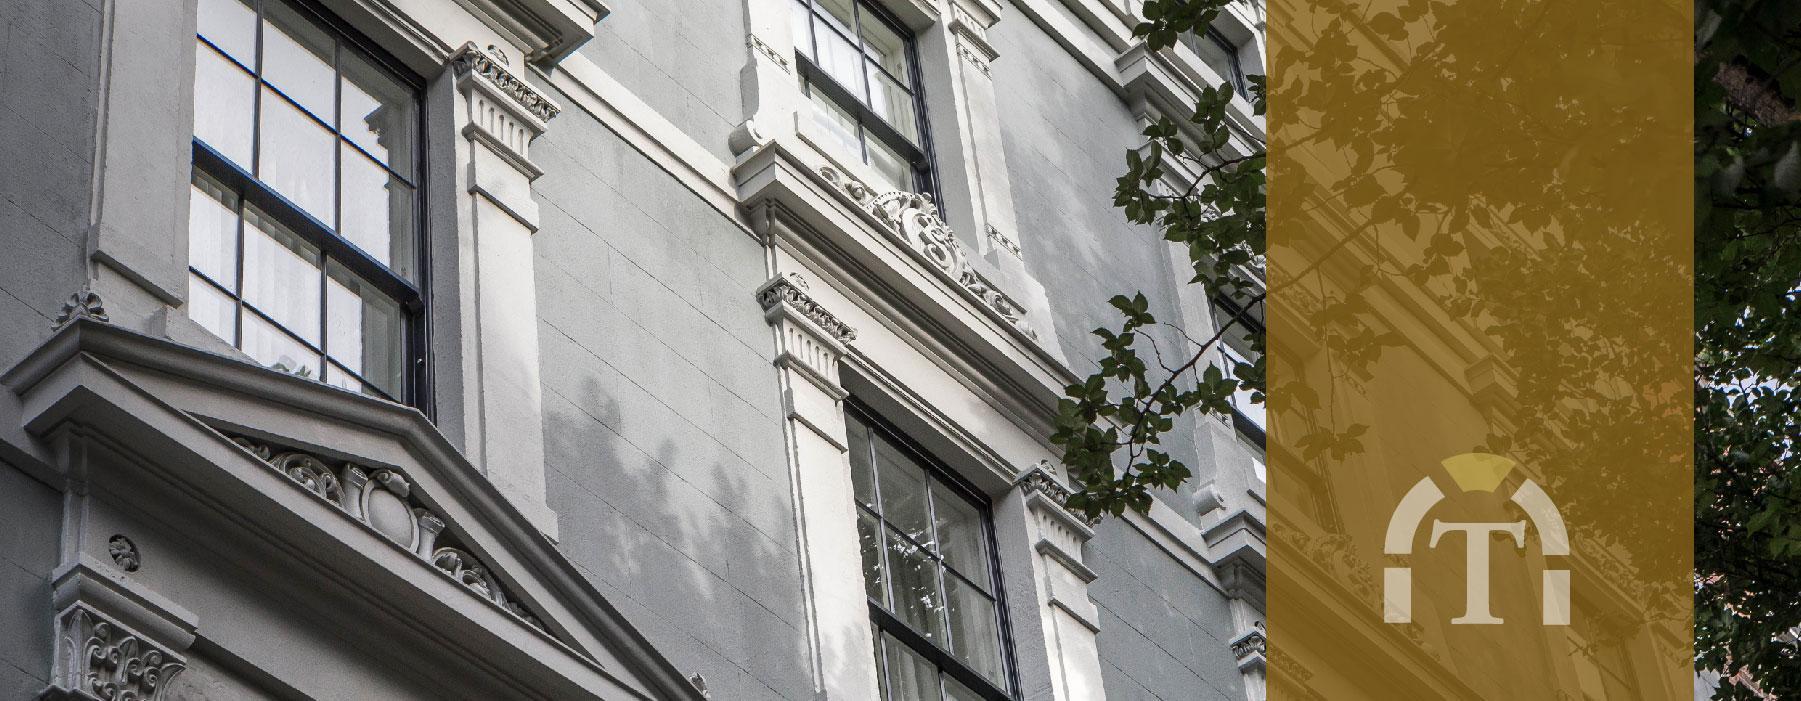 Timeless Wood & Sash Windows of Dublin